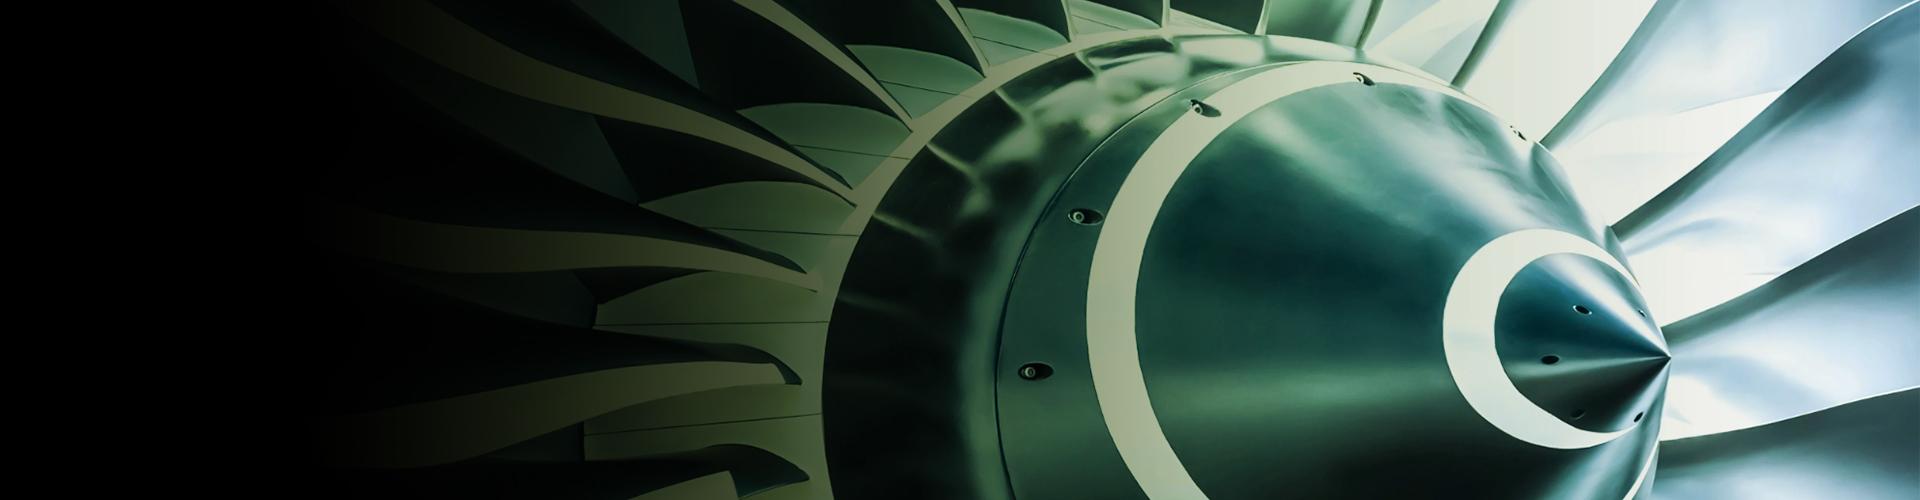 An engine turbine